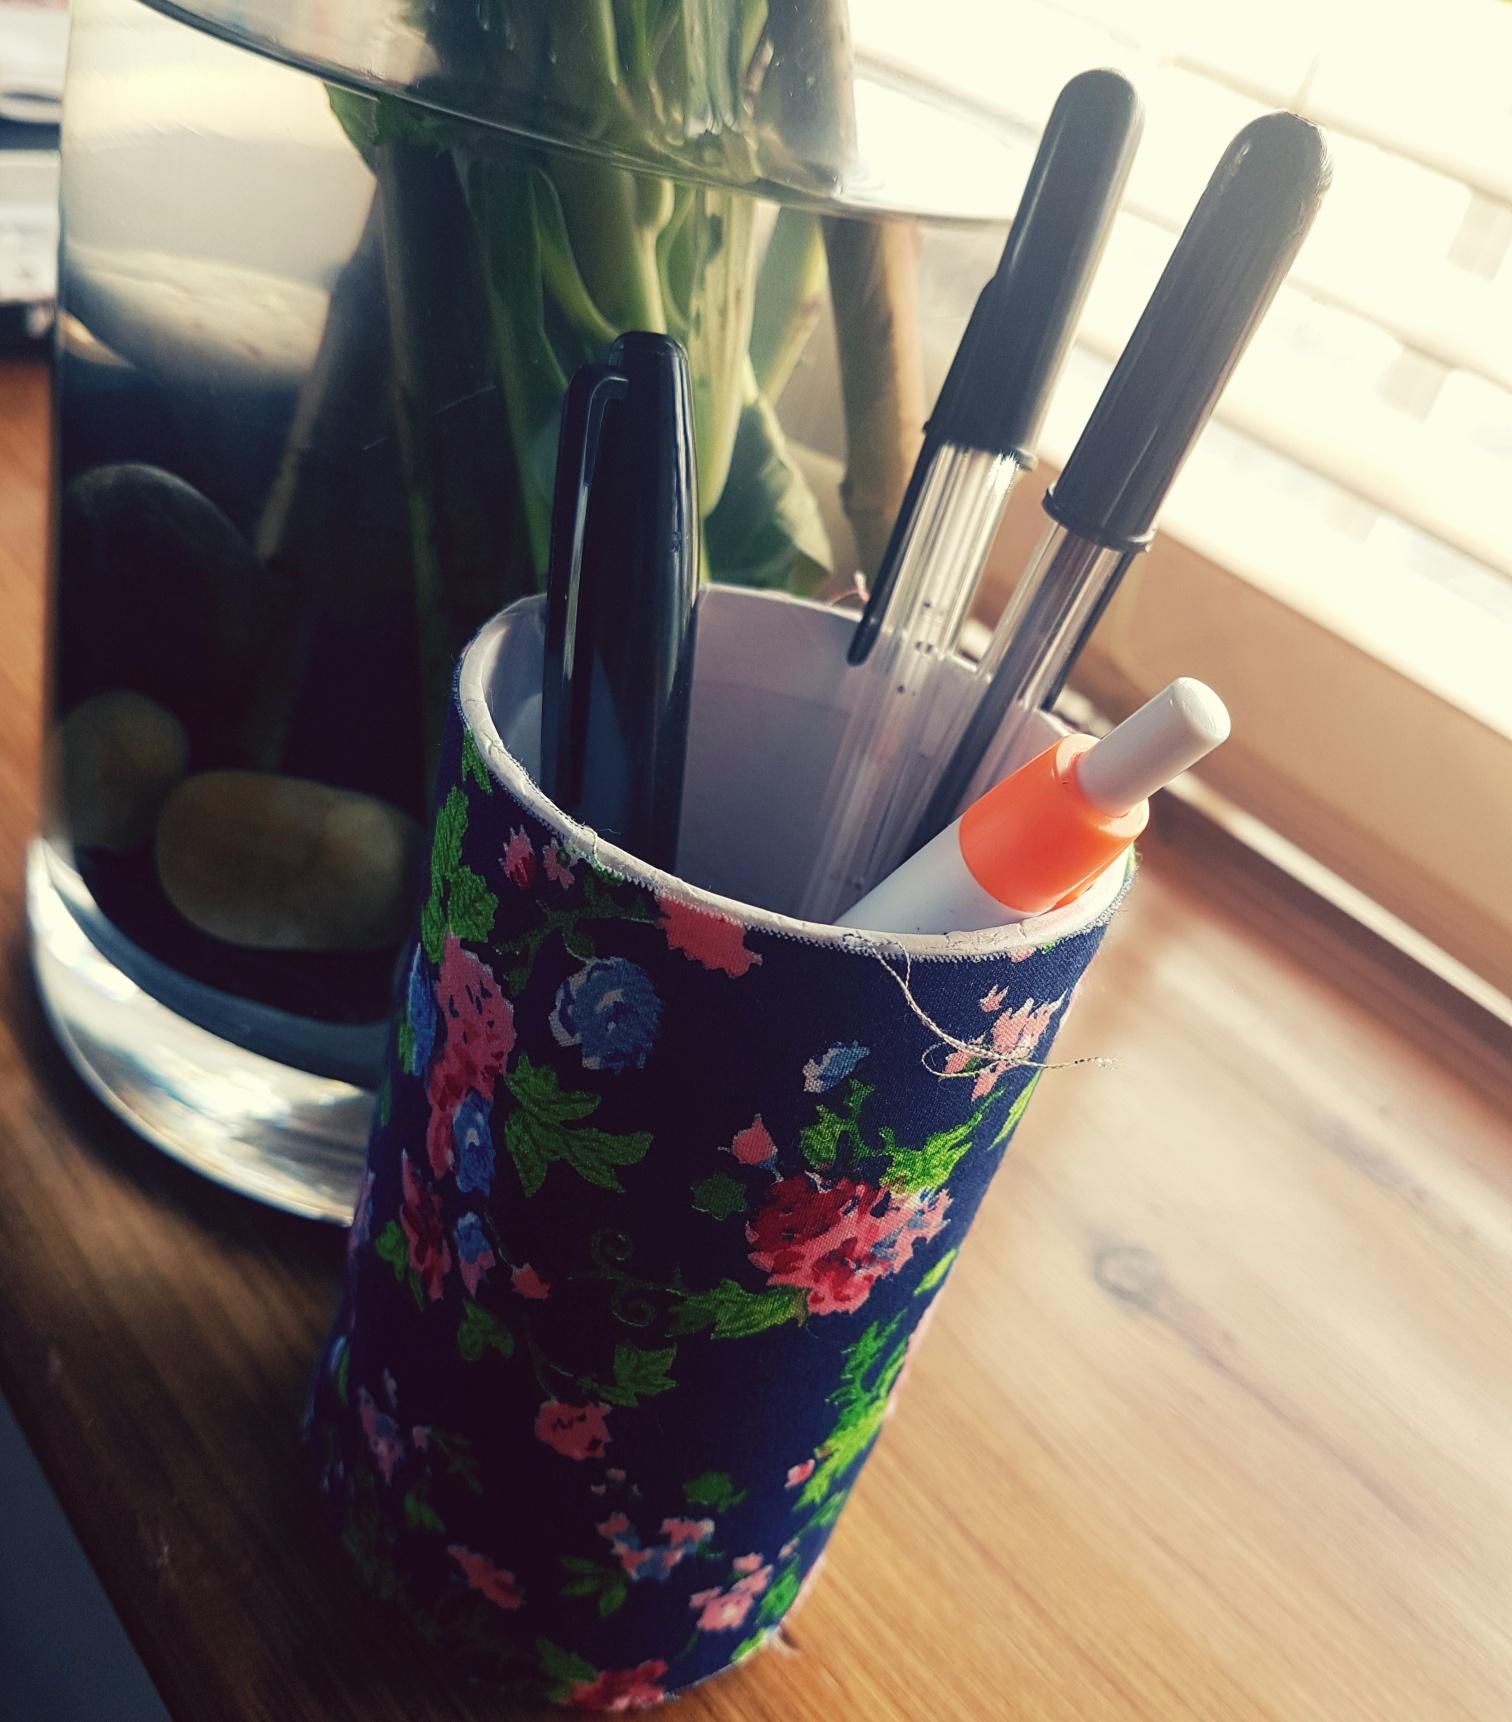 Bostik craft supplies